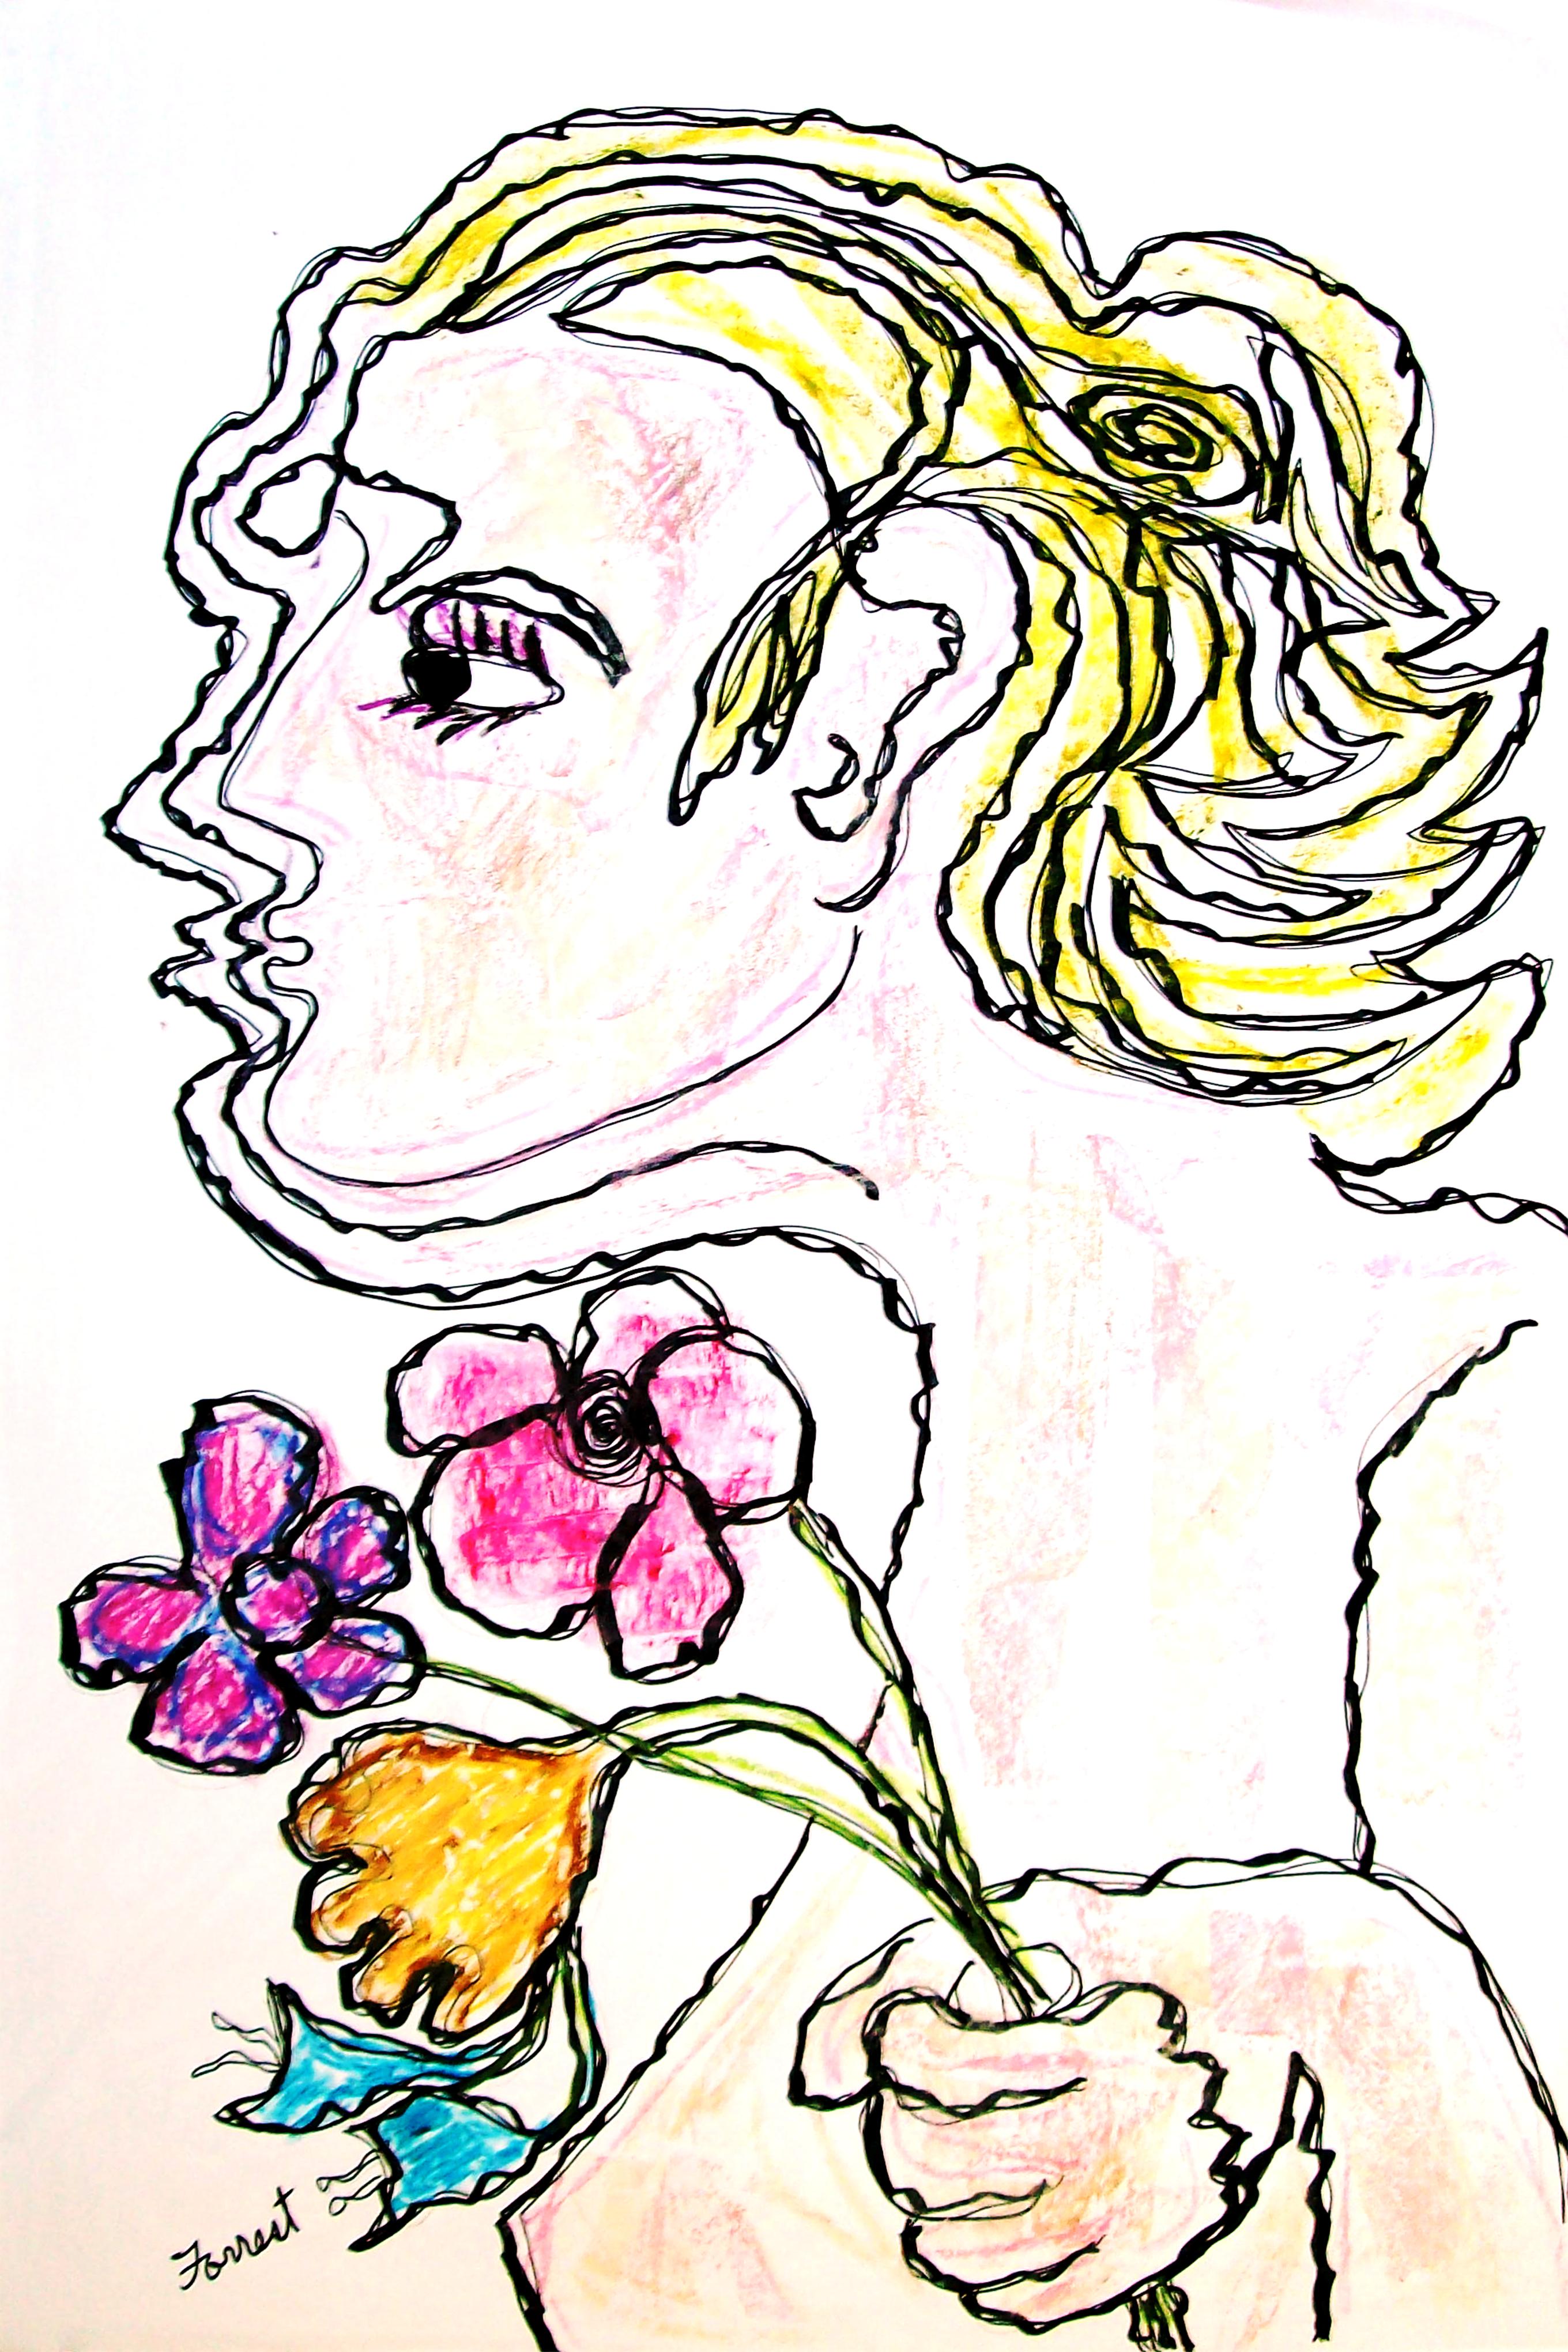 forrest_renaissance_renewed_the_bouquet_ink_oil_pastel_2016